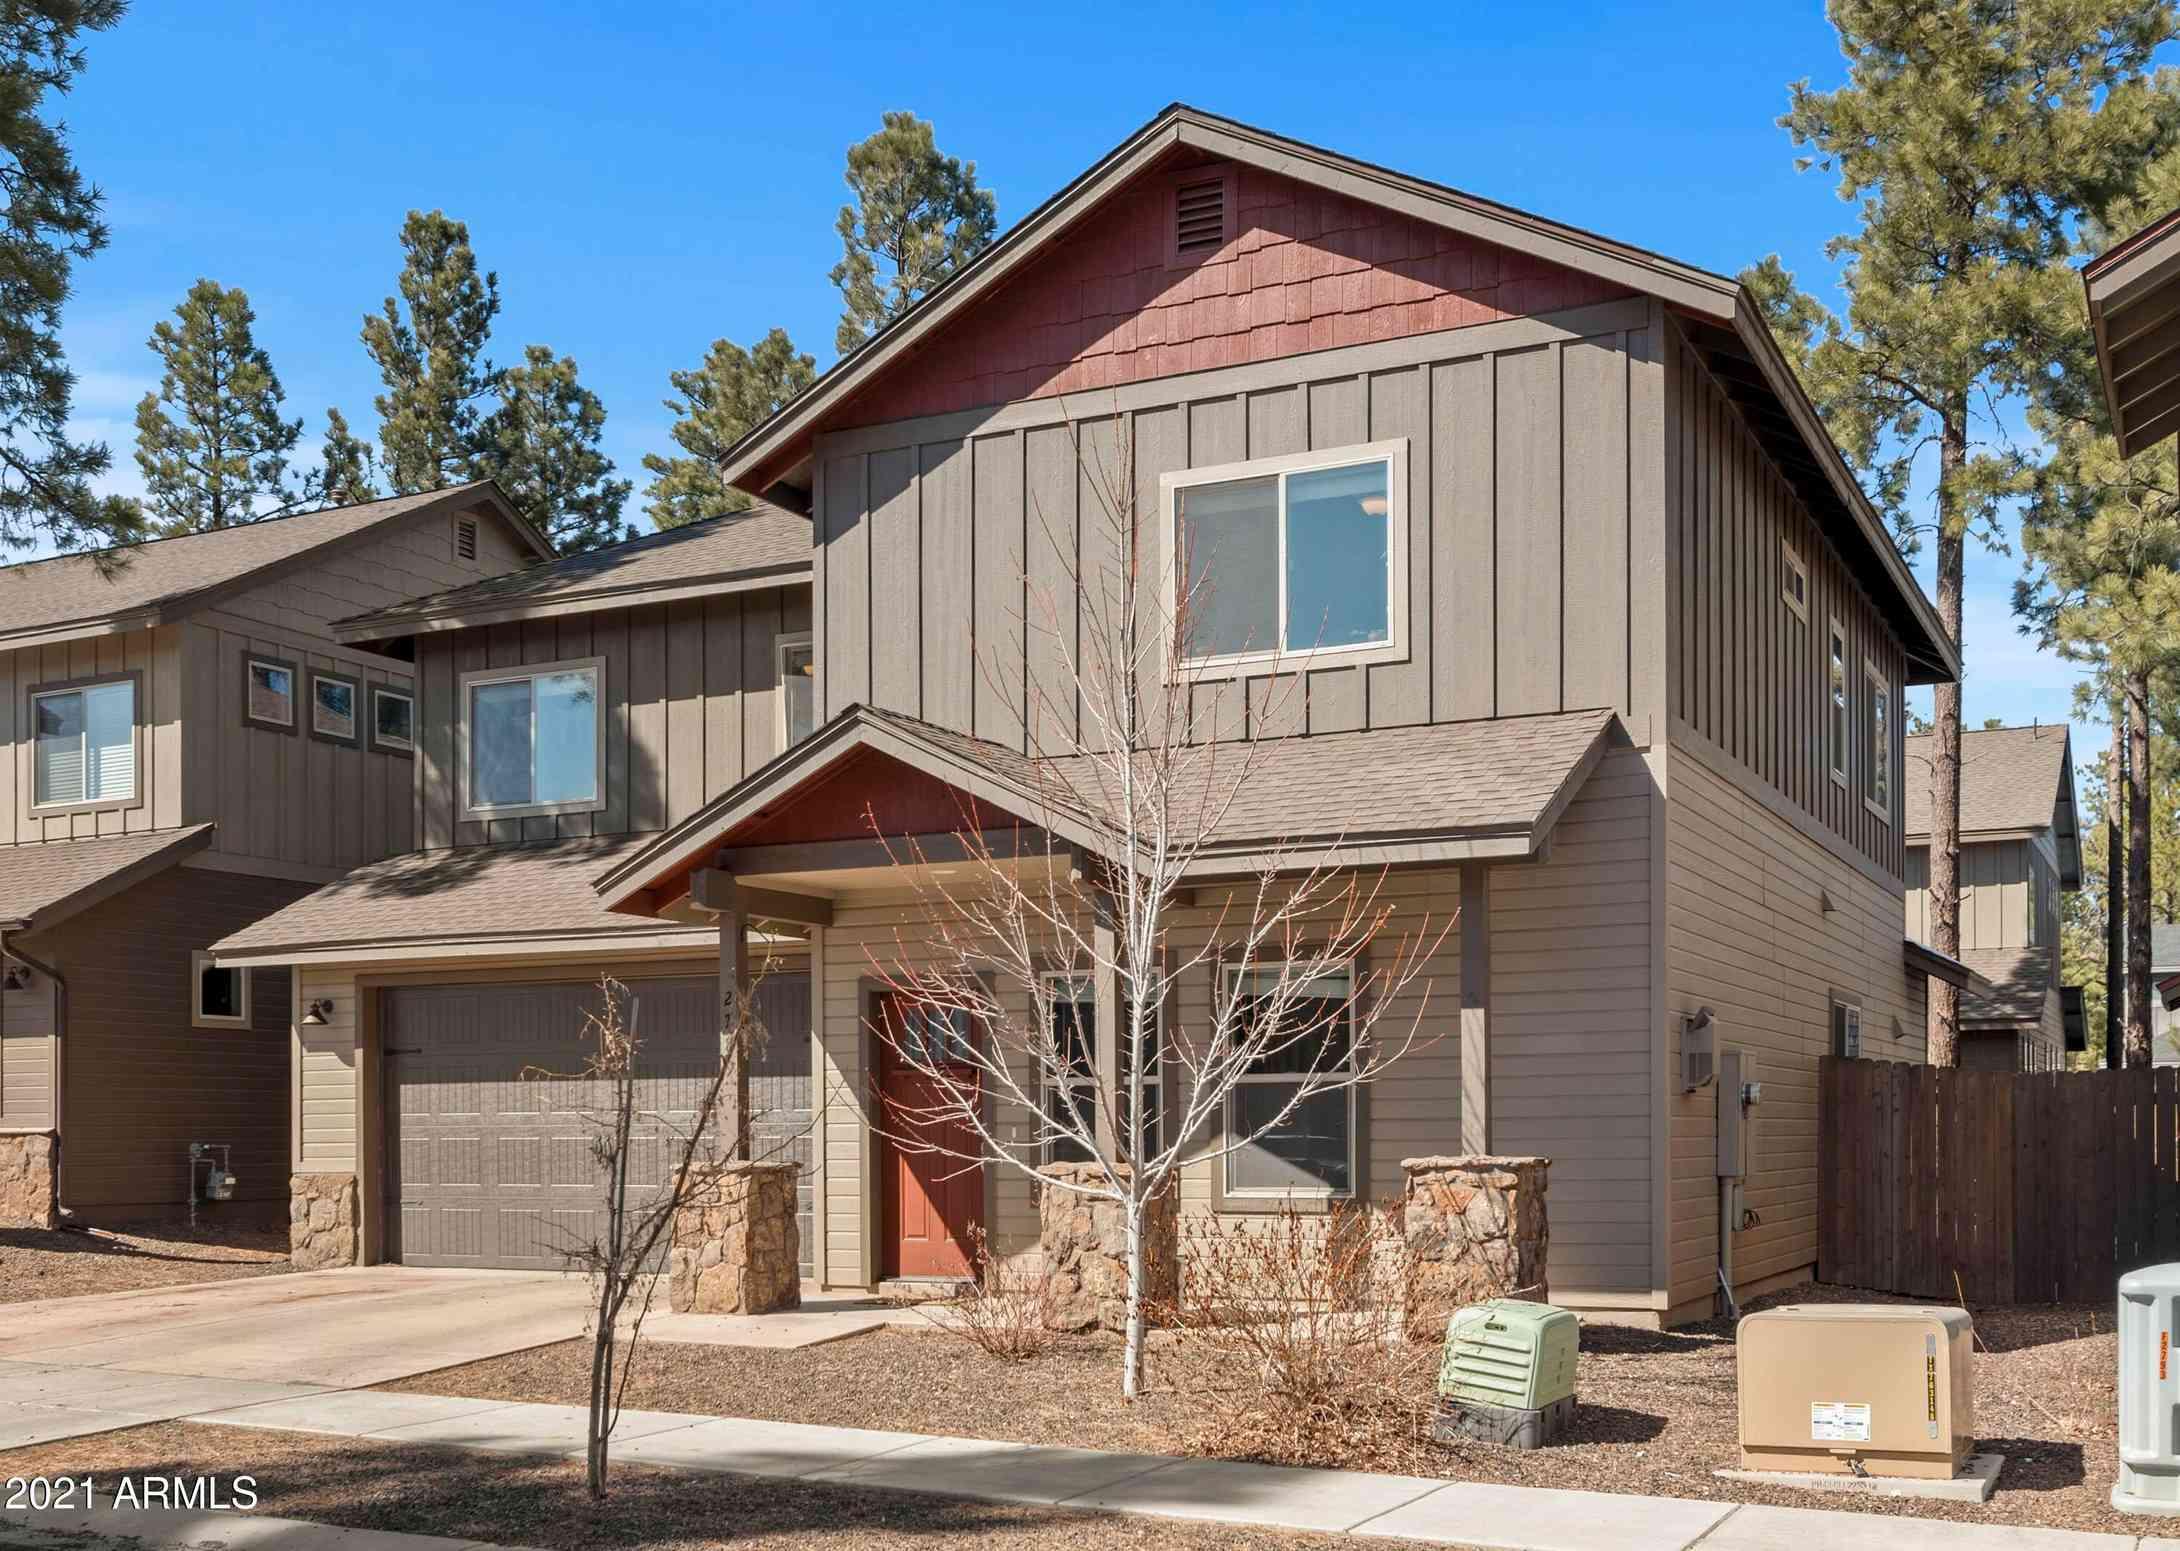 2789 W PICO DEL MONTE Circle, Flagstaff, AZ, 86001,